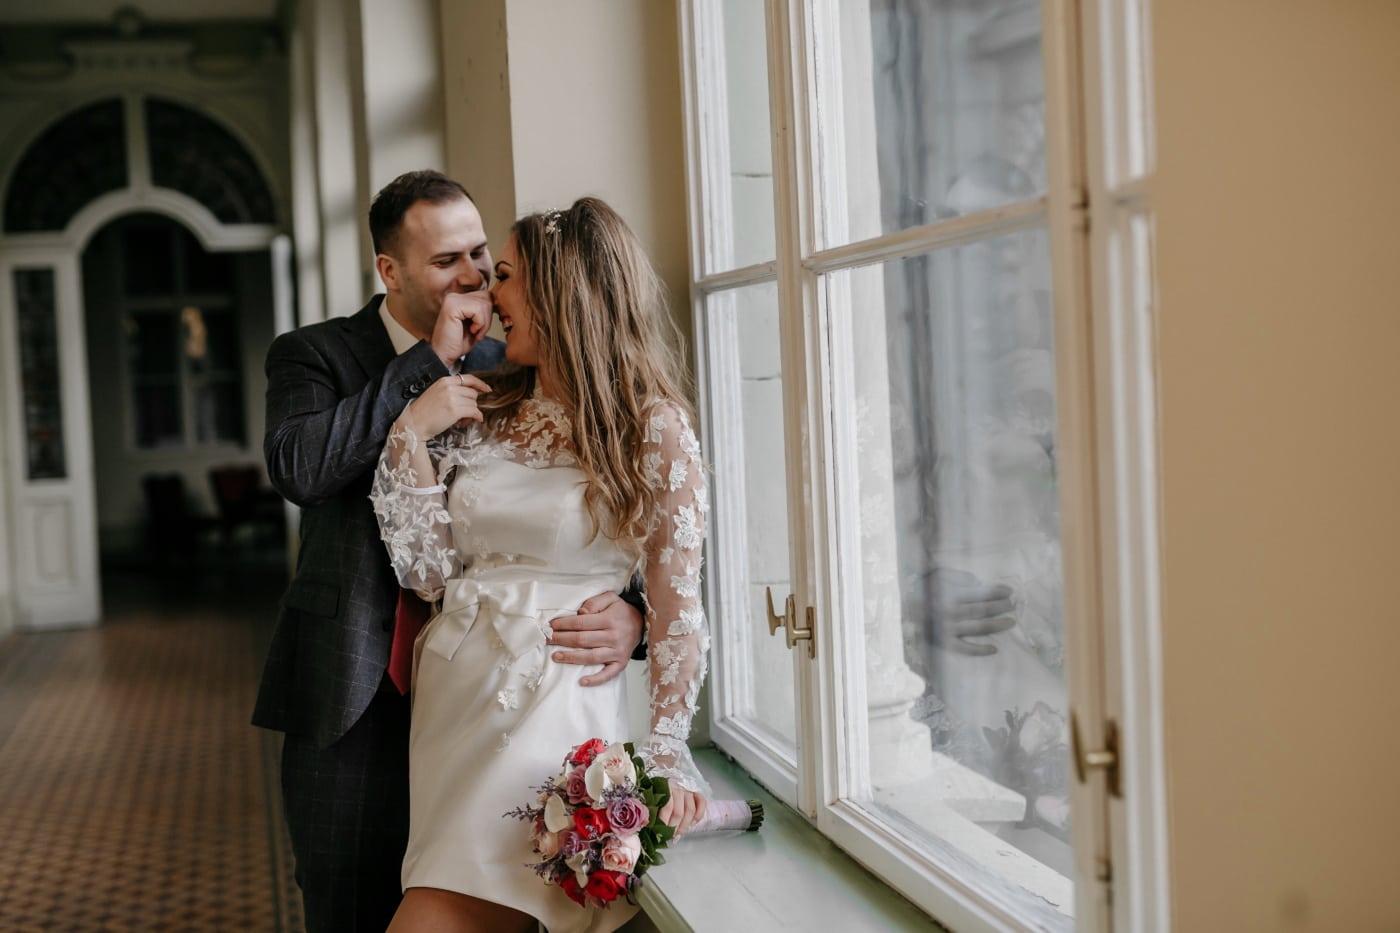 just married, hallway, home, woman, groom, couple, bride, wedding, love, man